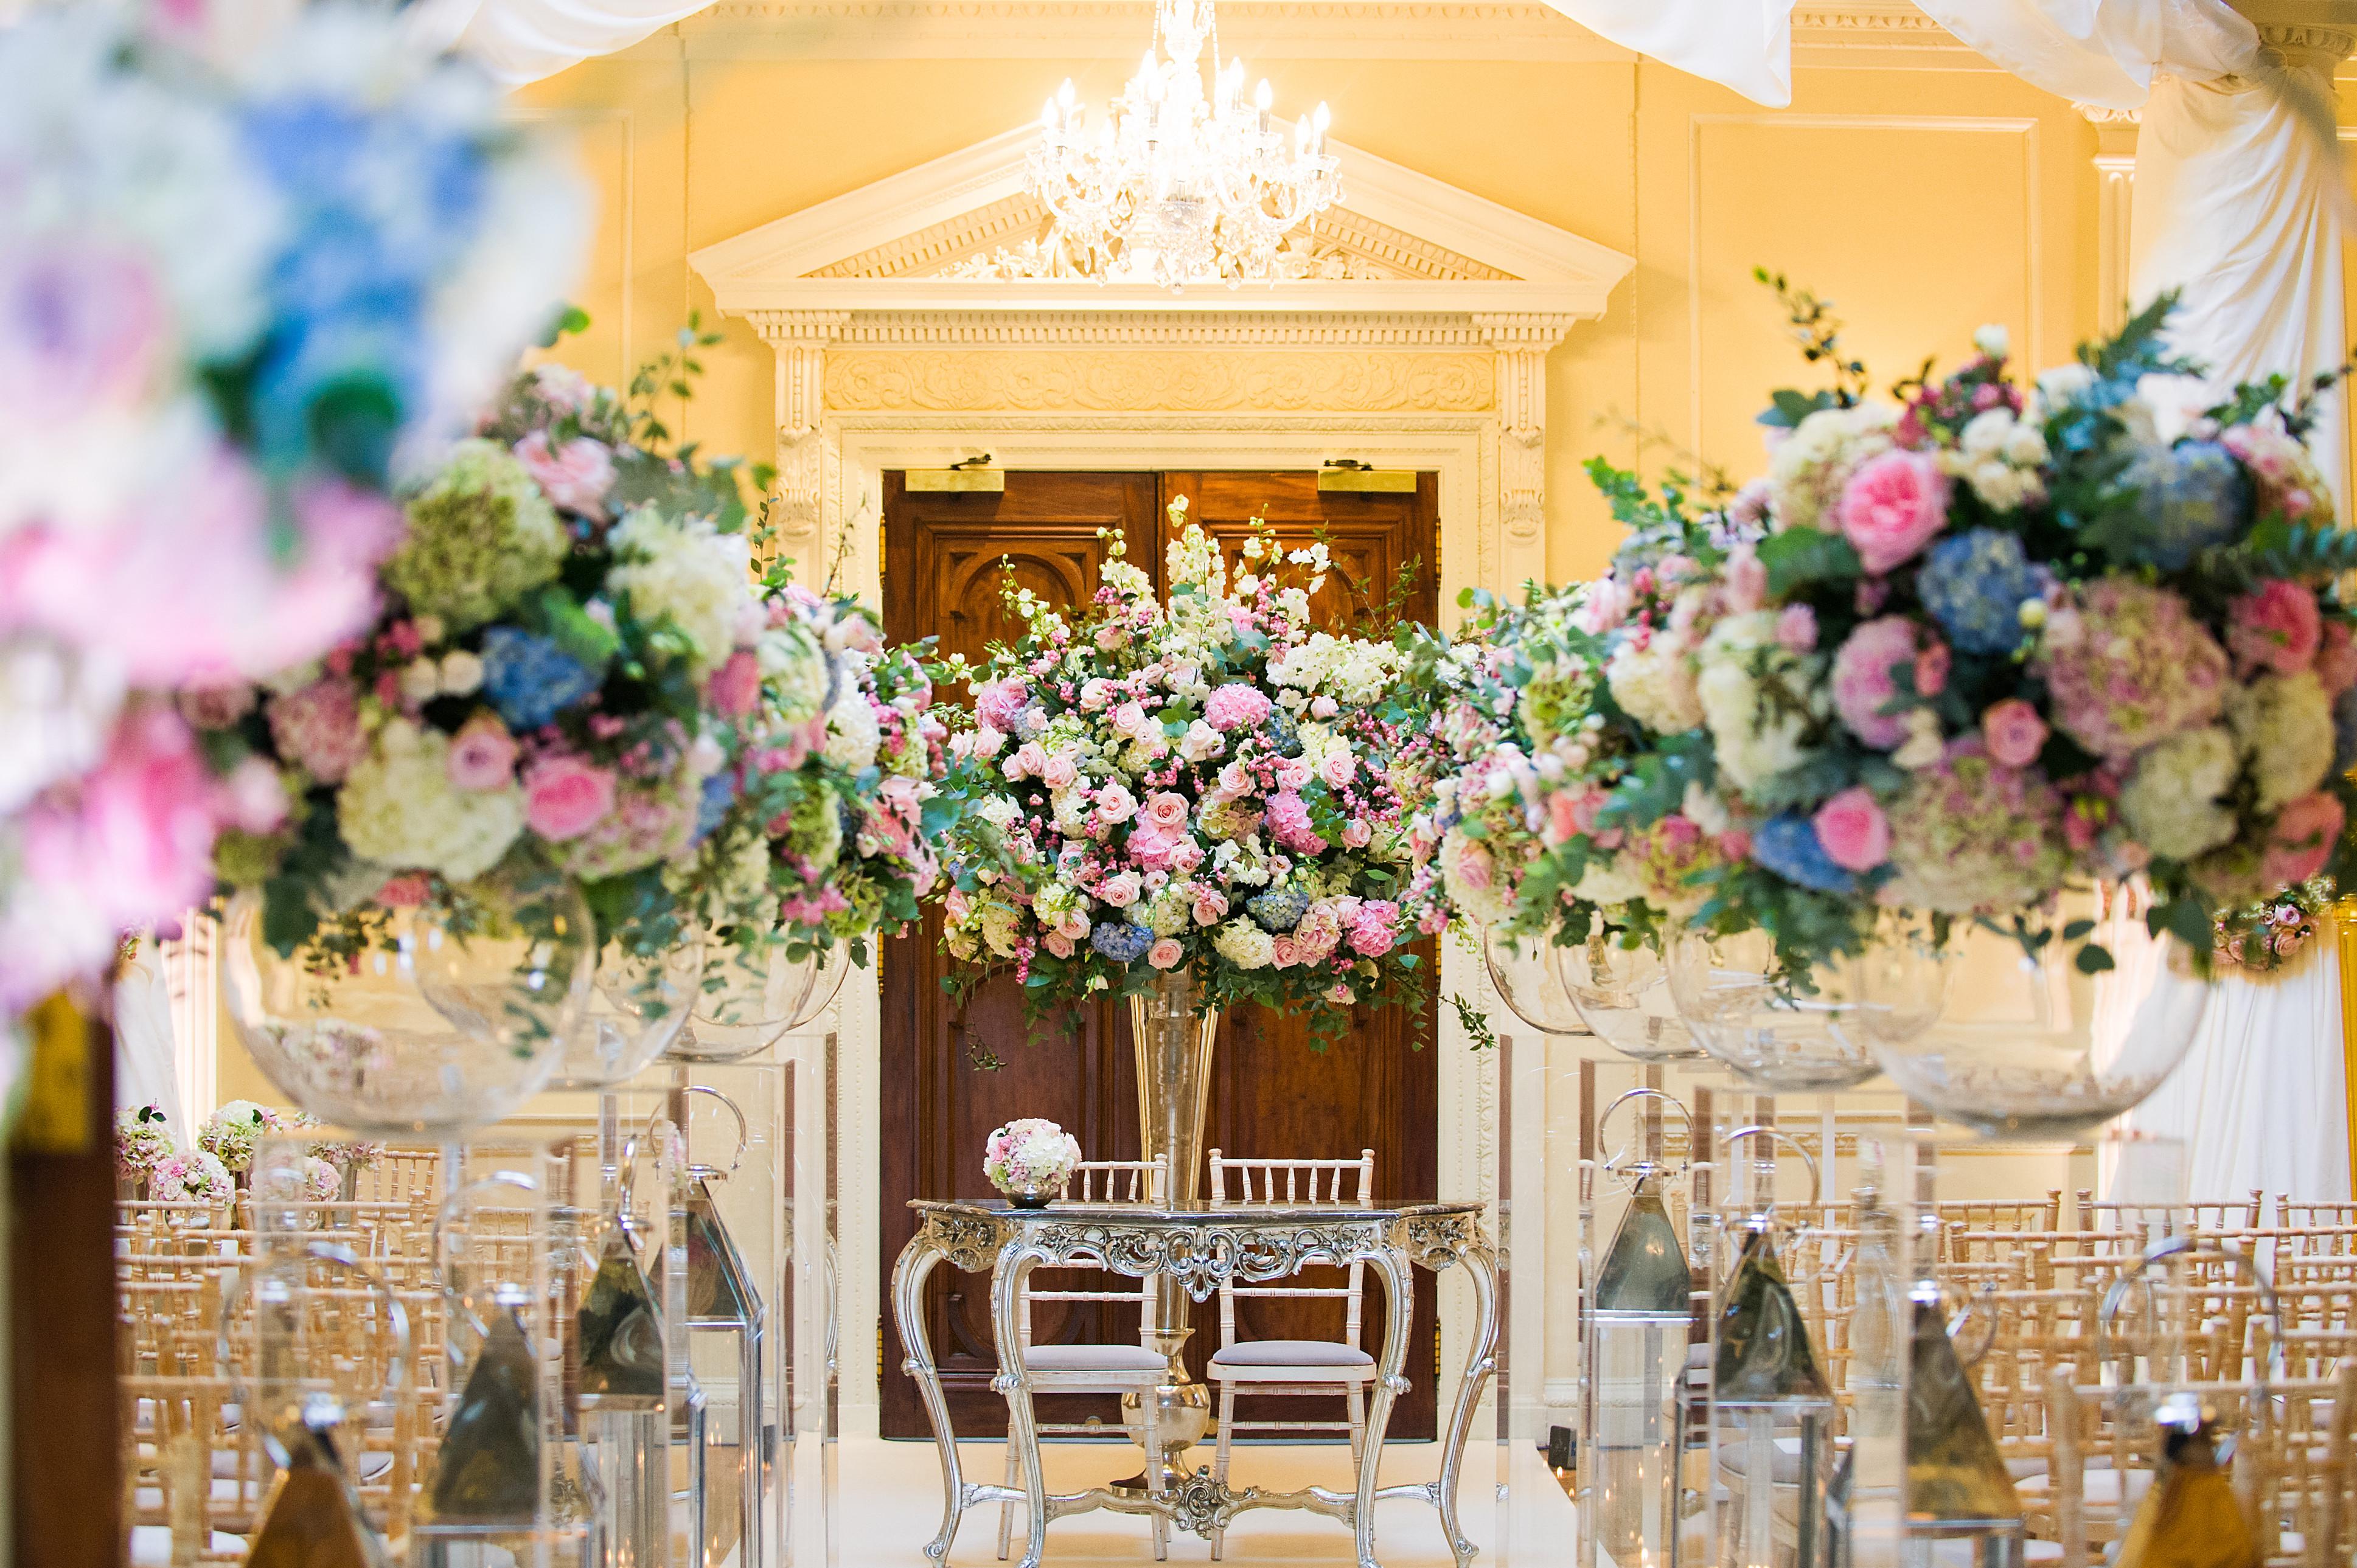 Bridebook.co.uk- Ceremony venue decorated with flowers